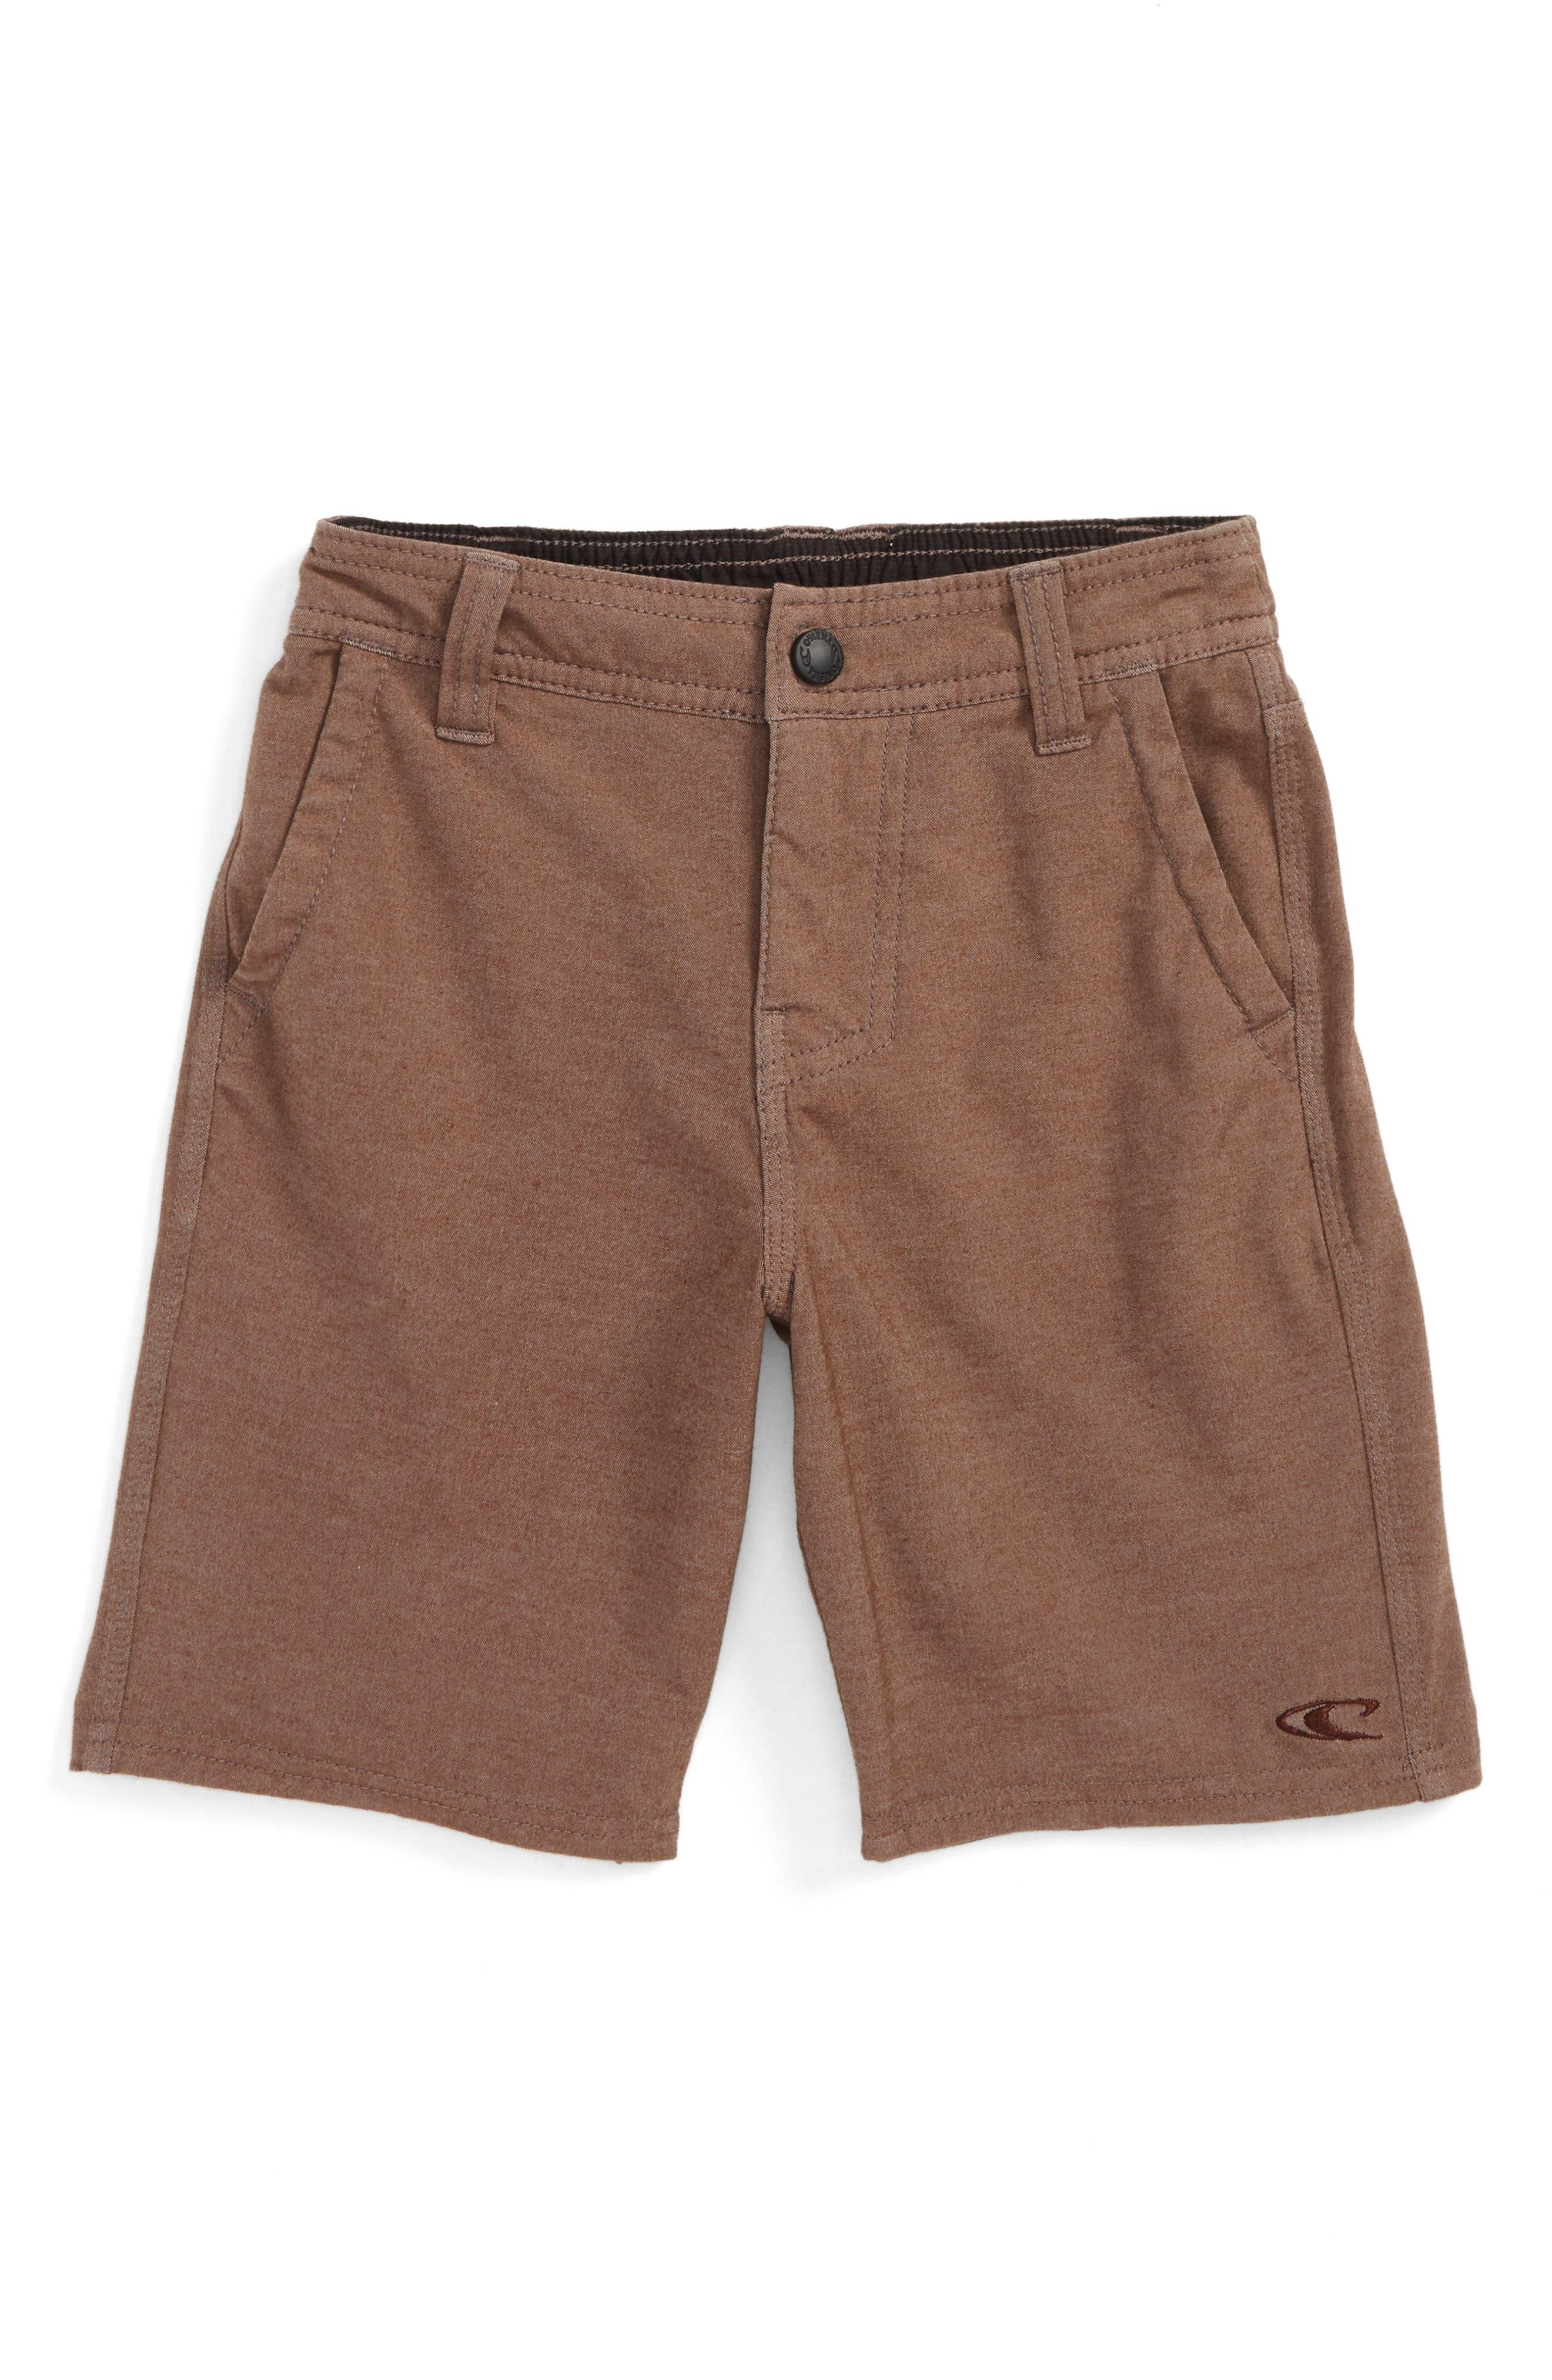 Locked Hybrid Board Shorts,                             Main thumbnail 1, color,                             216